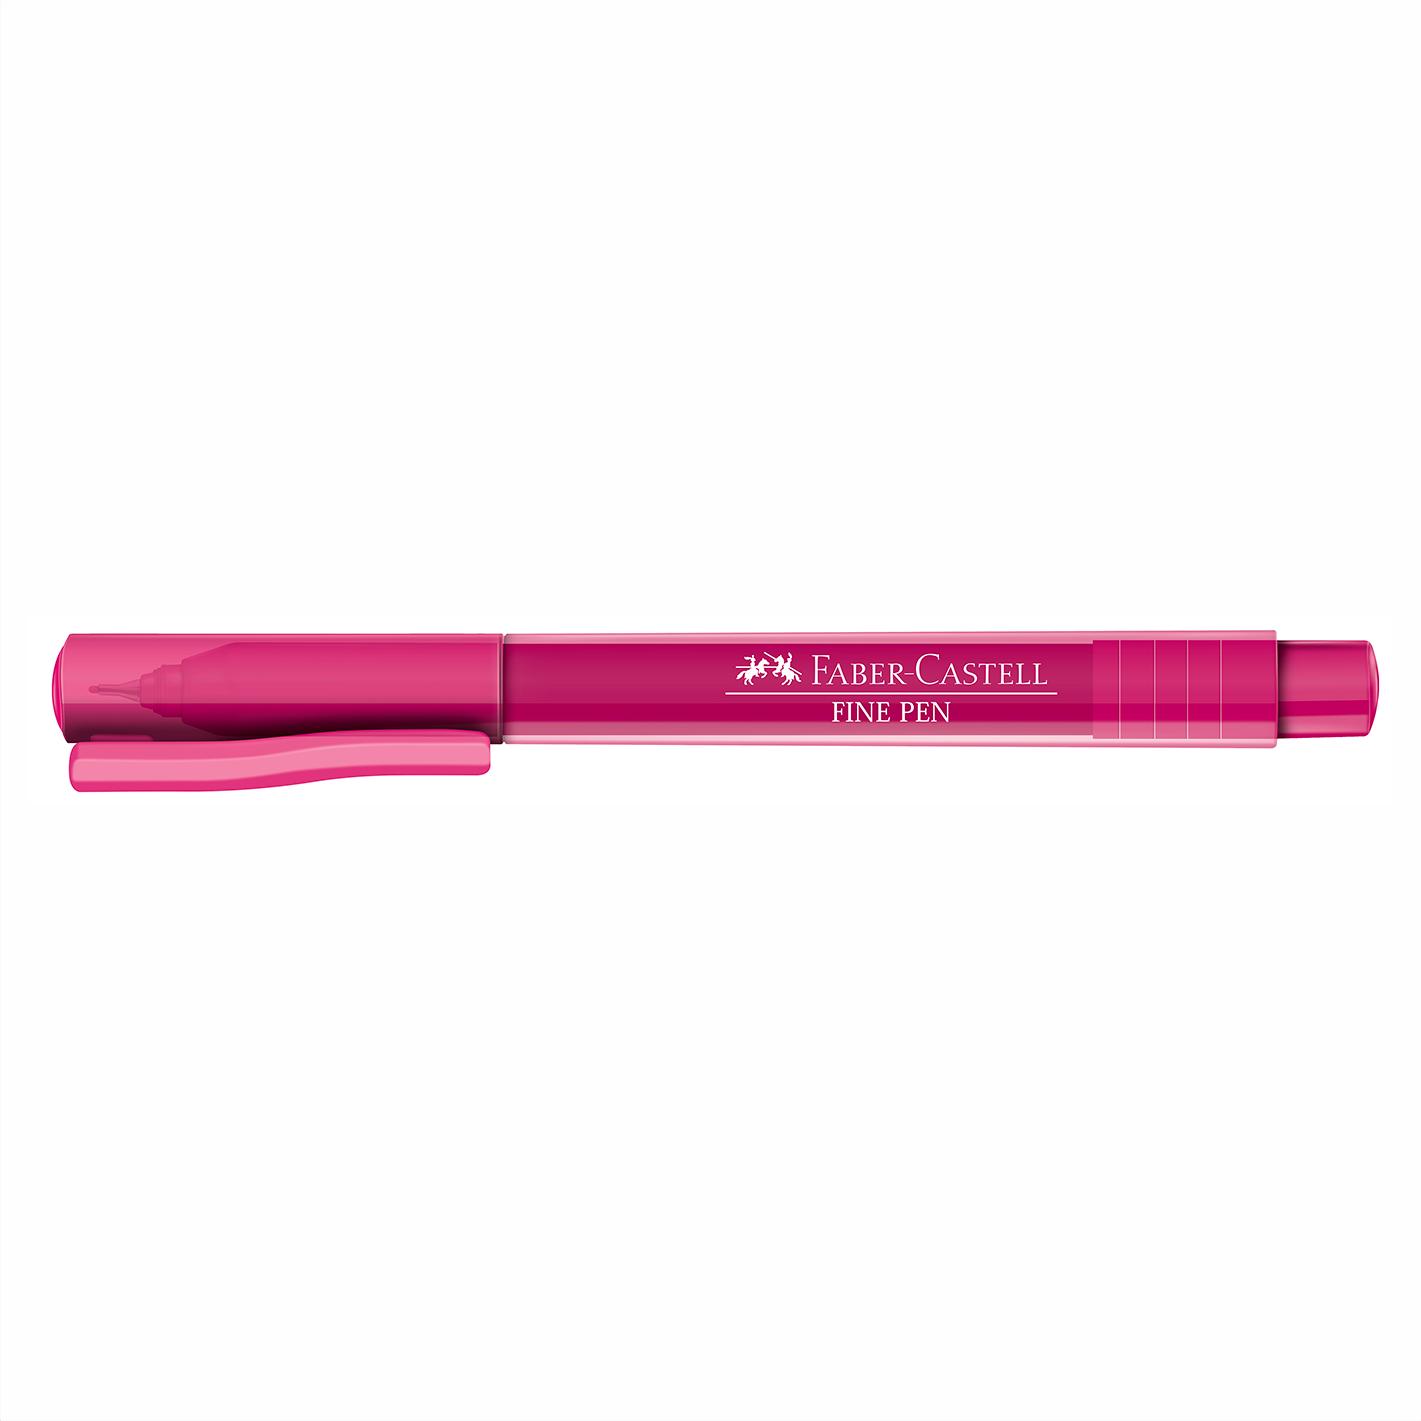 Caneta Hidrográfica 0.4 rosa FINE PEN Faber-Castell